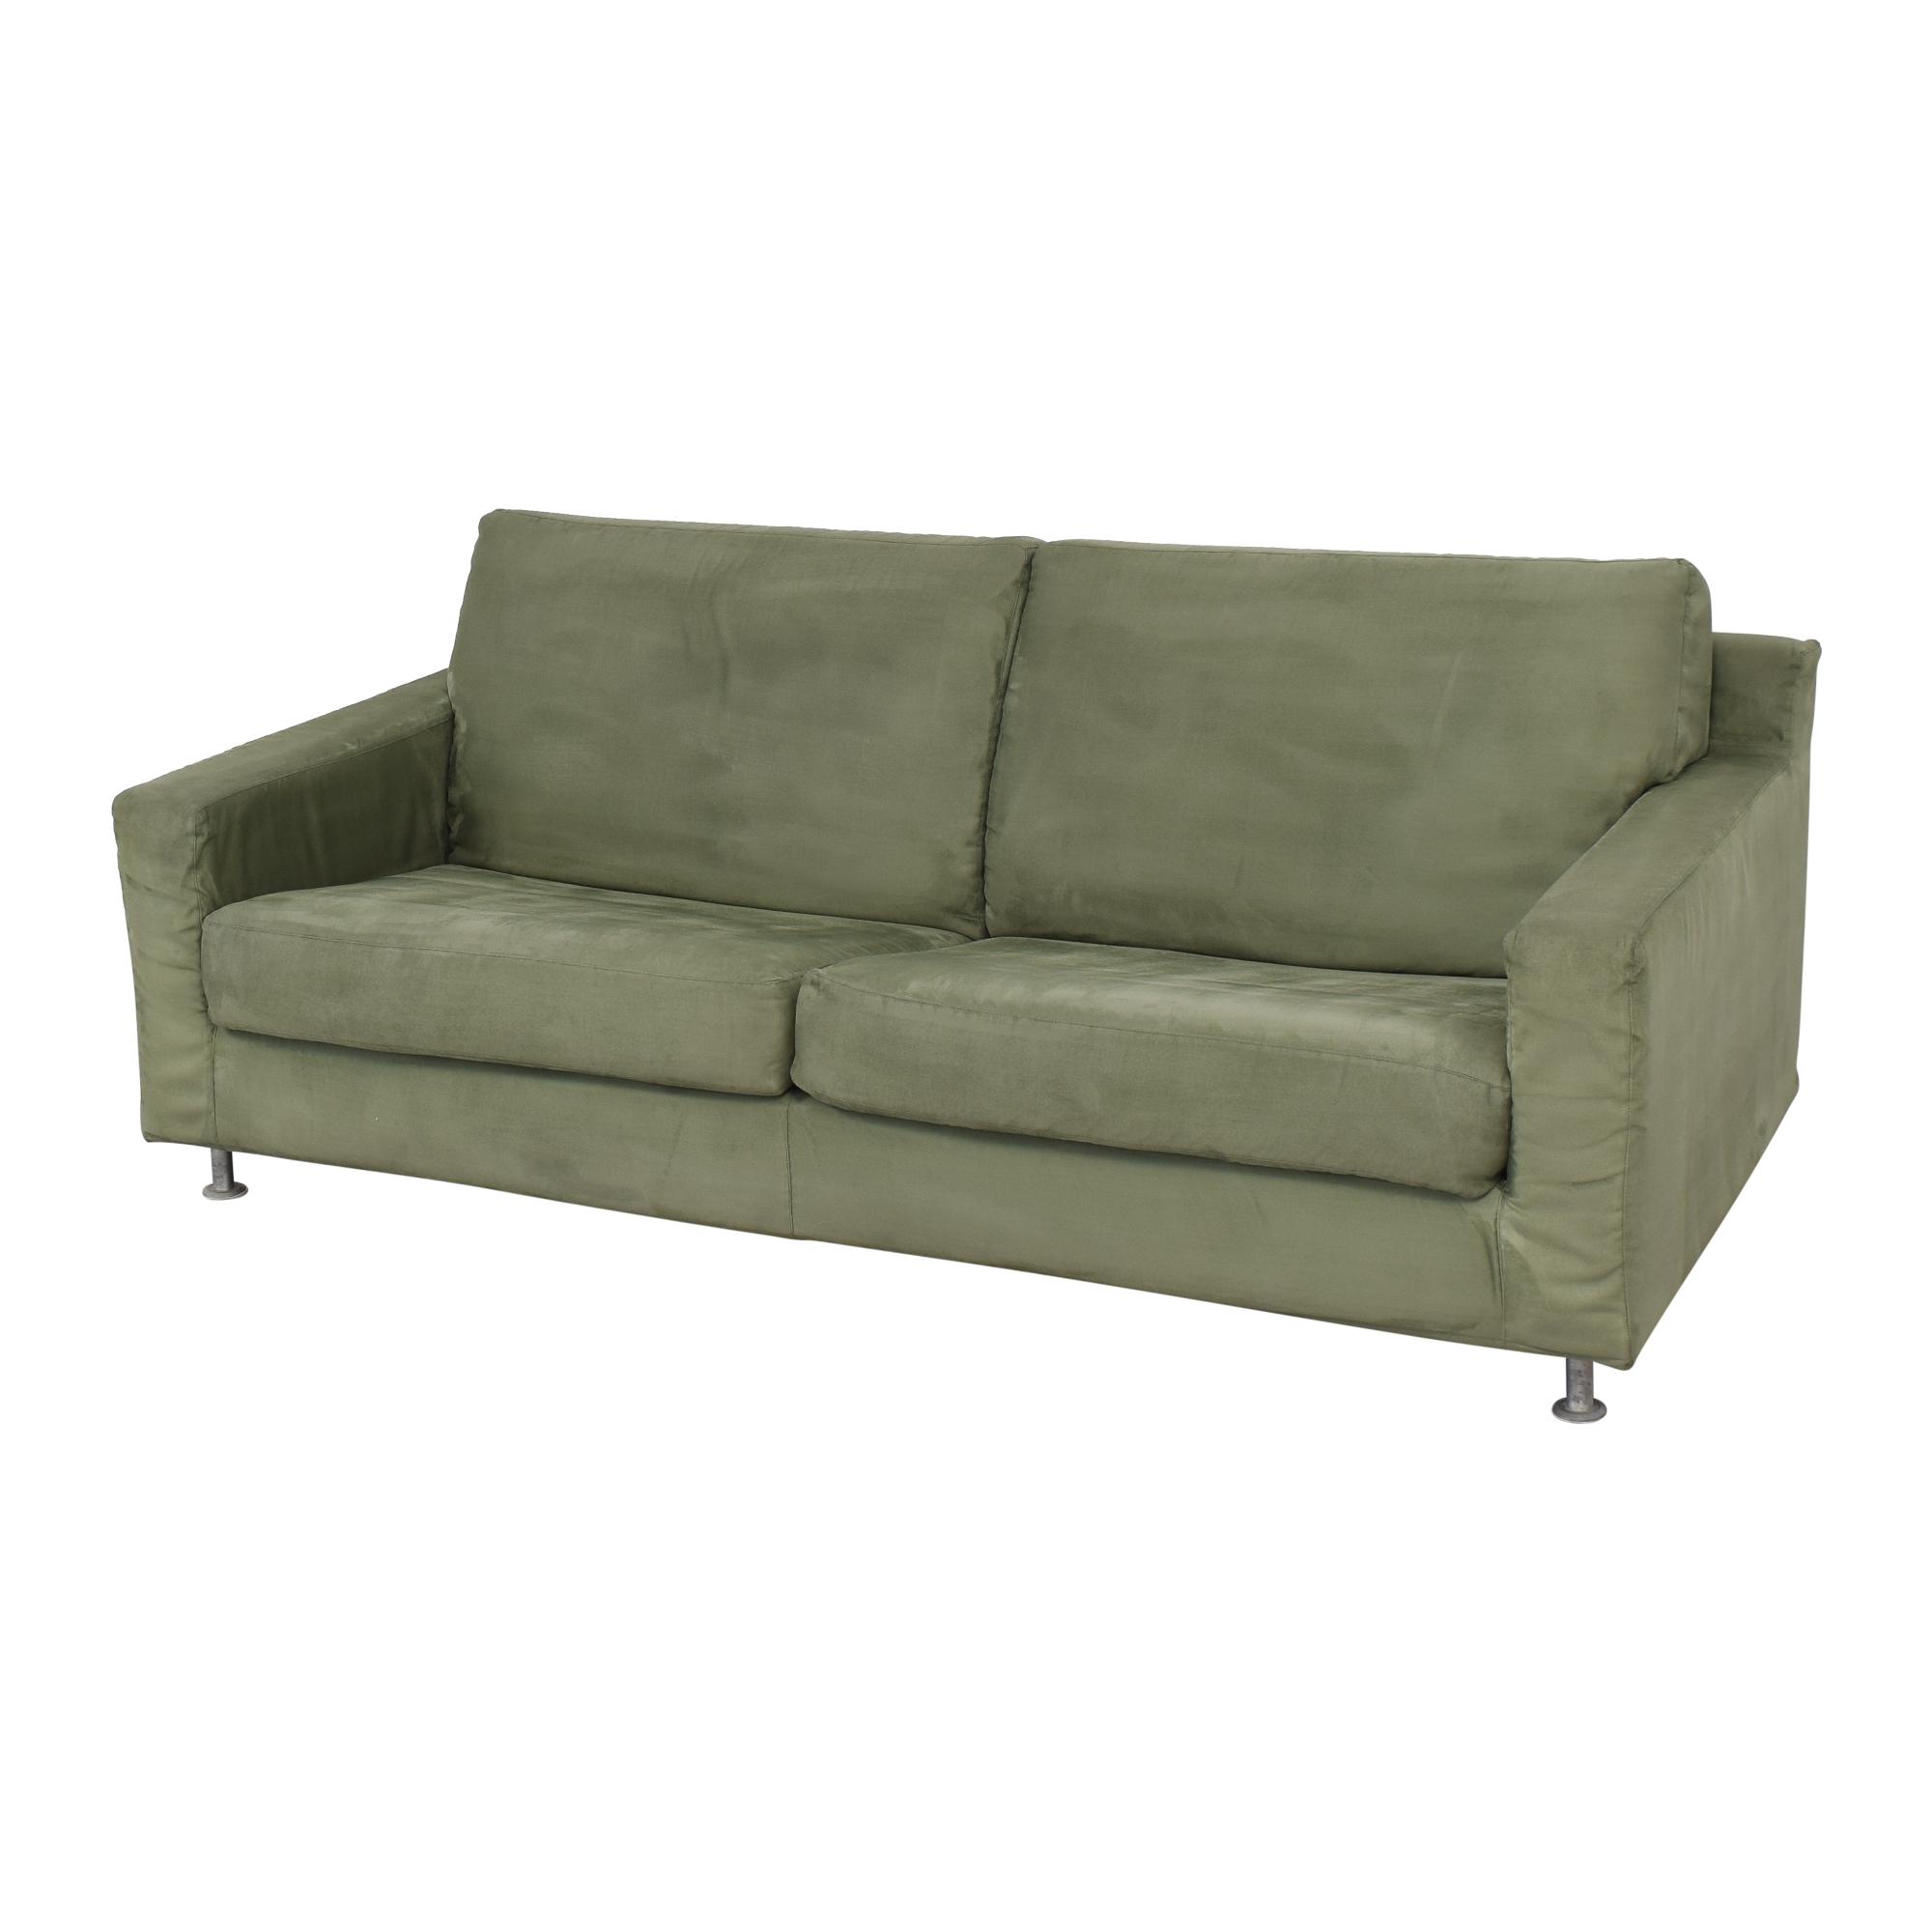 buy Maurice Villency Maurice Villency Sofa Bed online